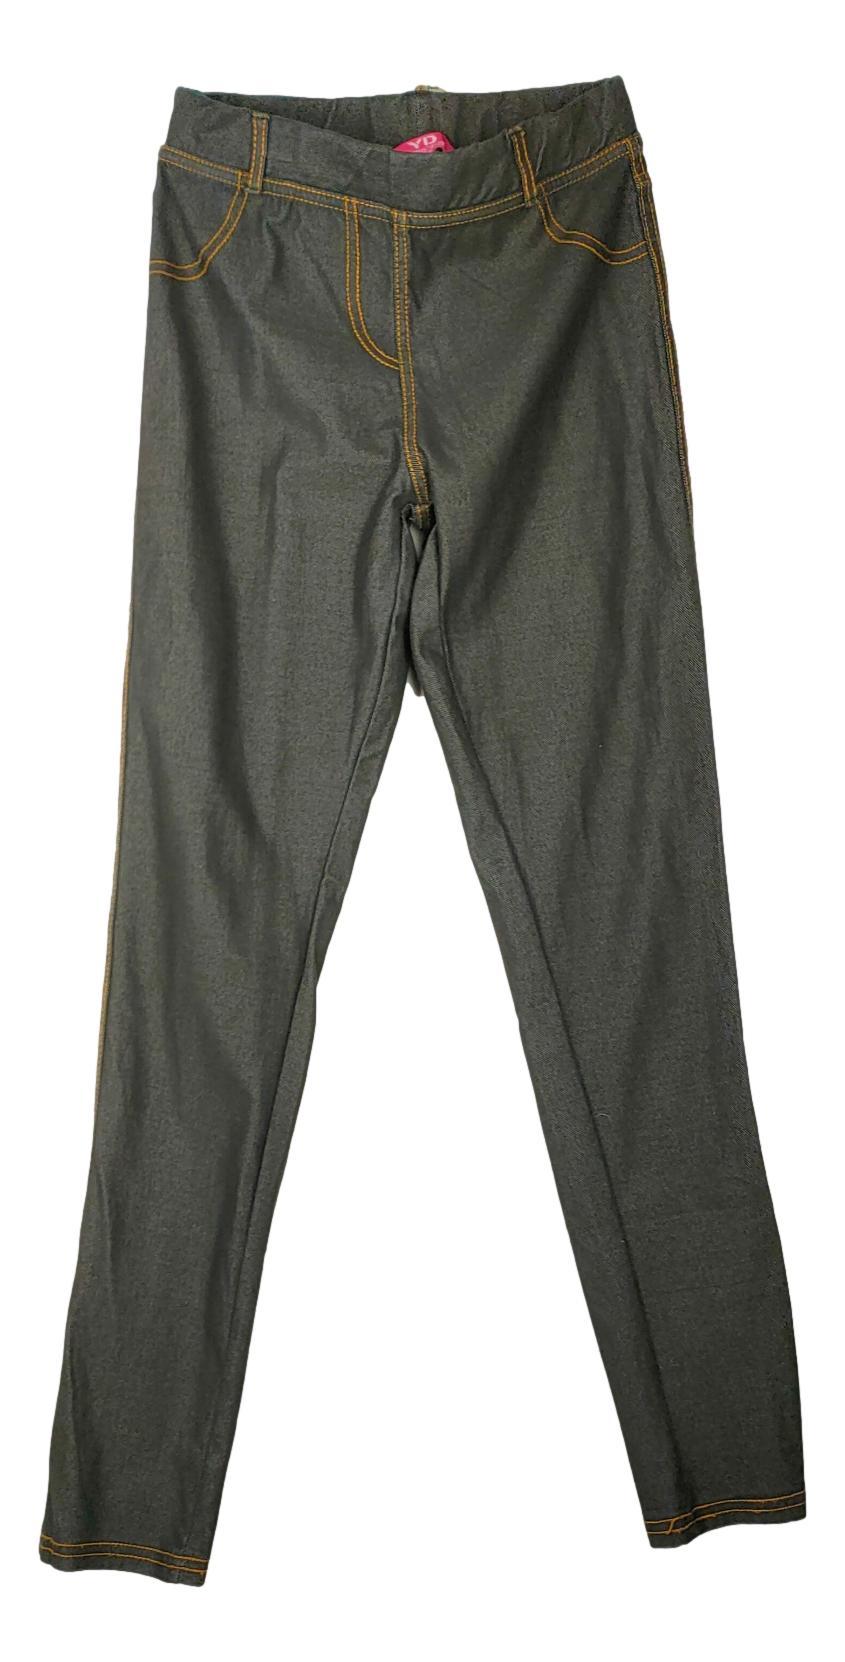 Pantalon YD - Taille 12 ans